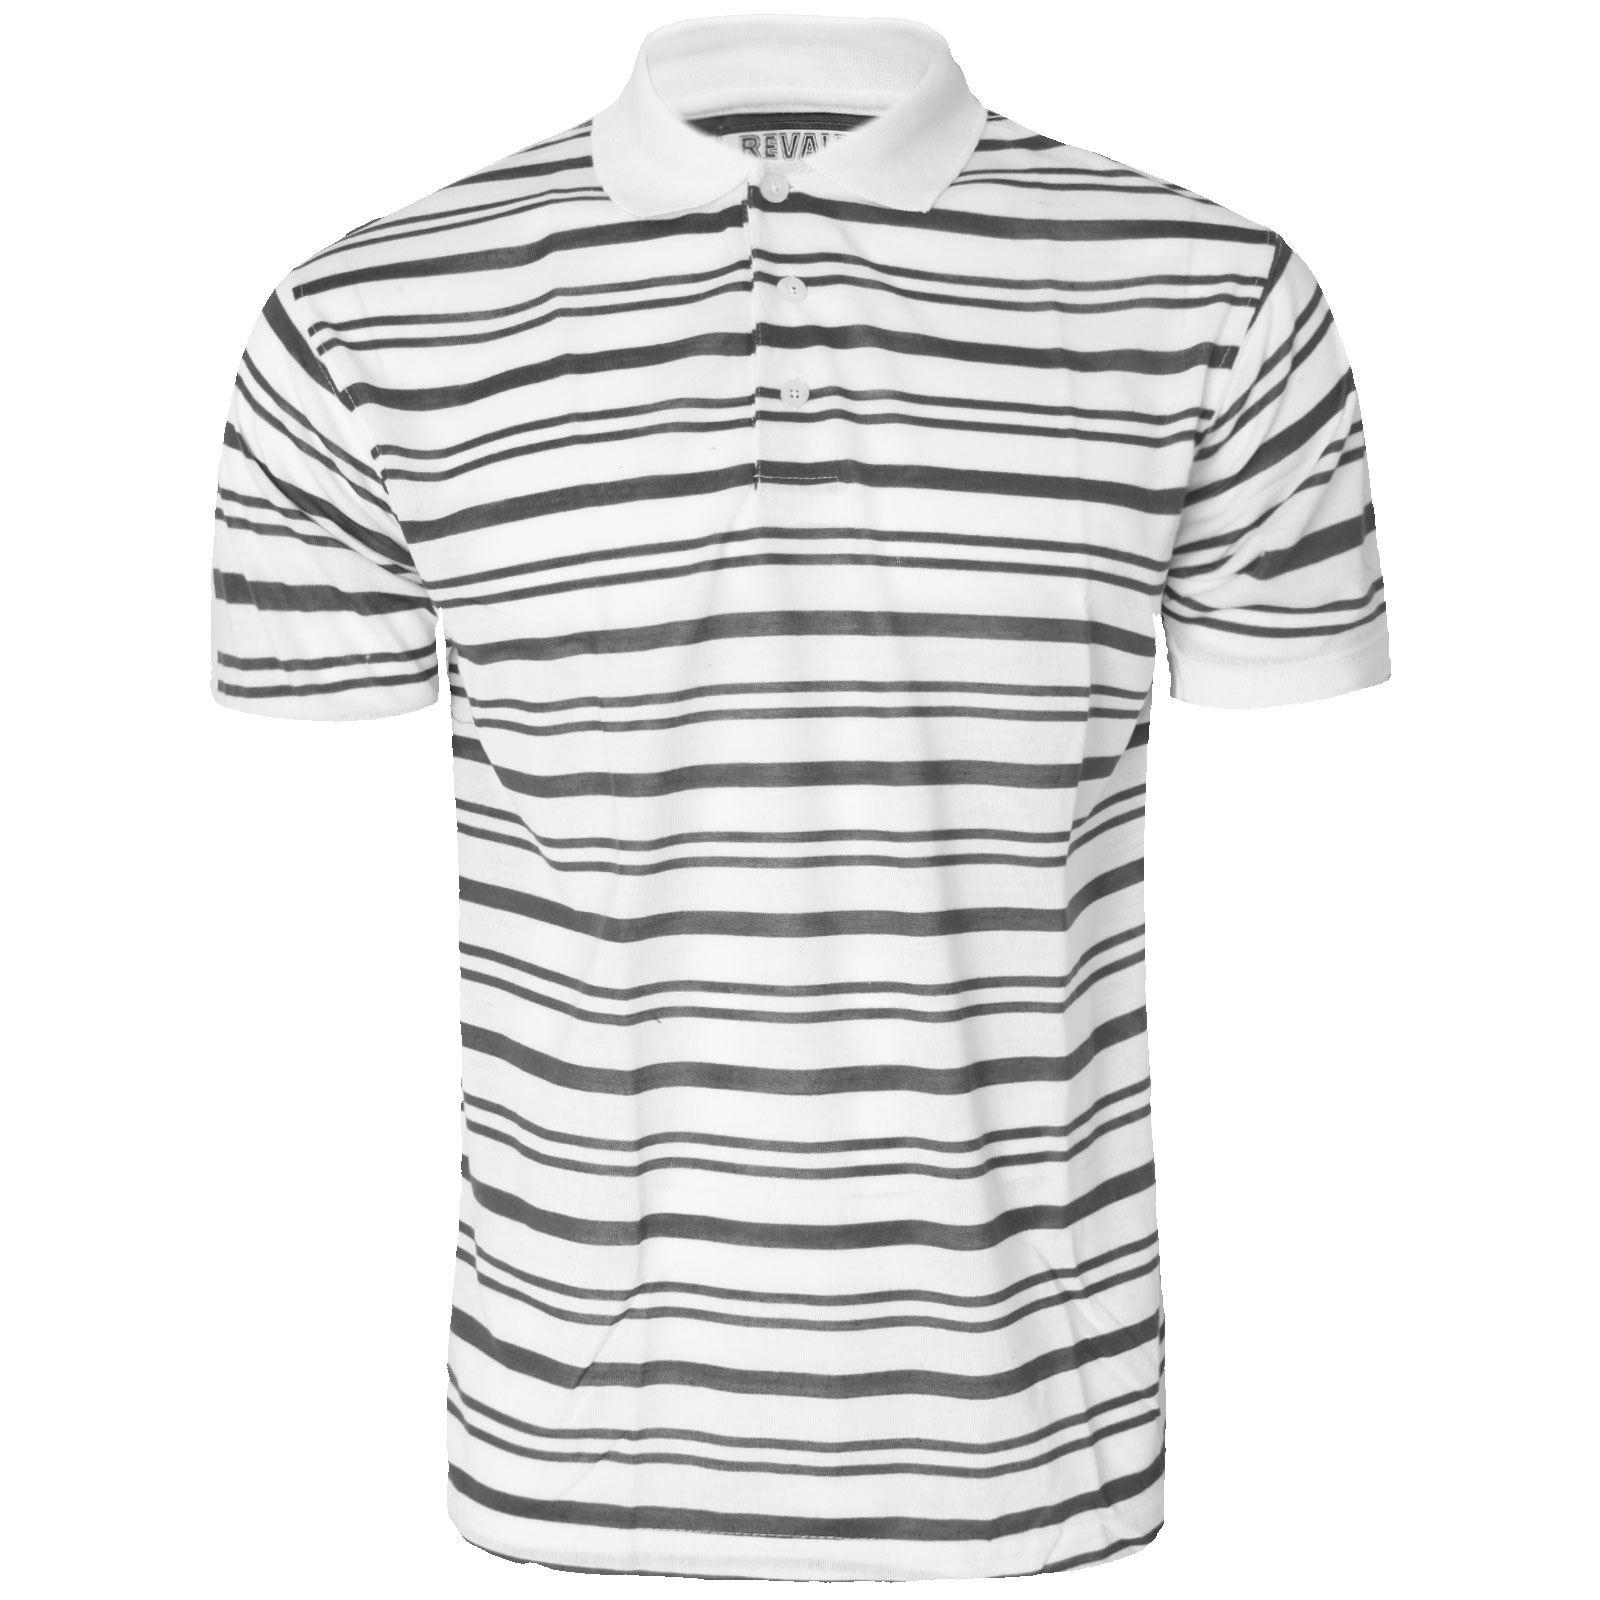 Black and white striped t shirt xxl - New Mens Short Sleeve Plain Polo Tshirt Top